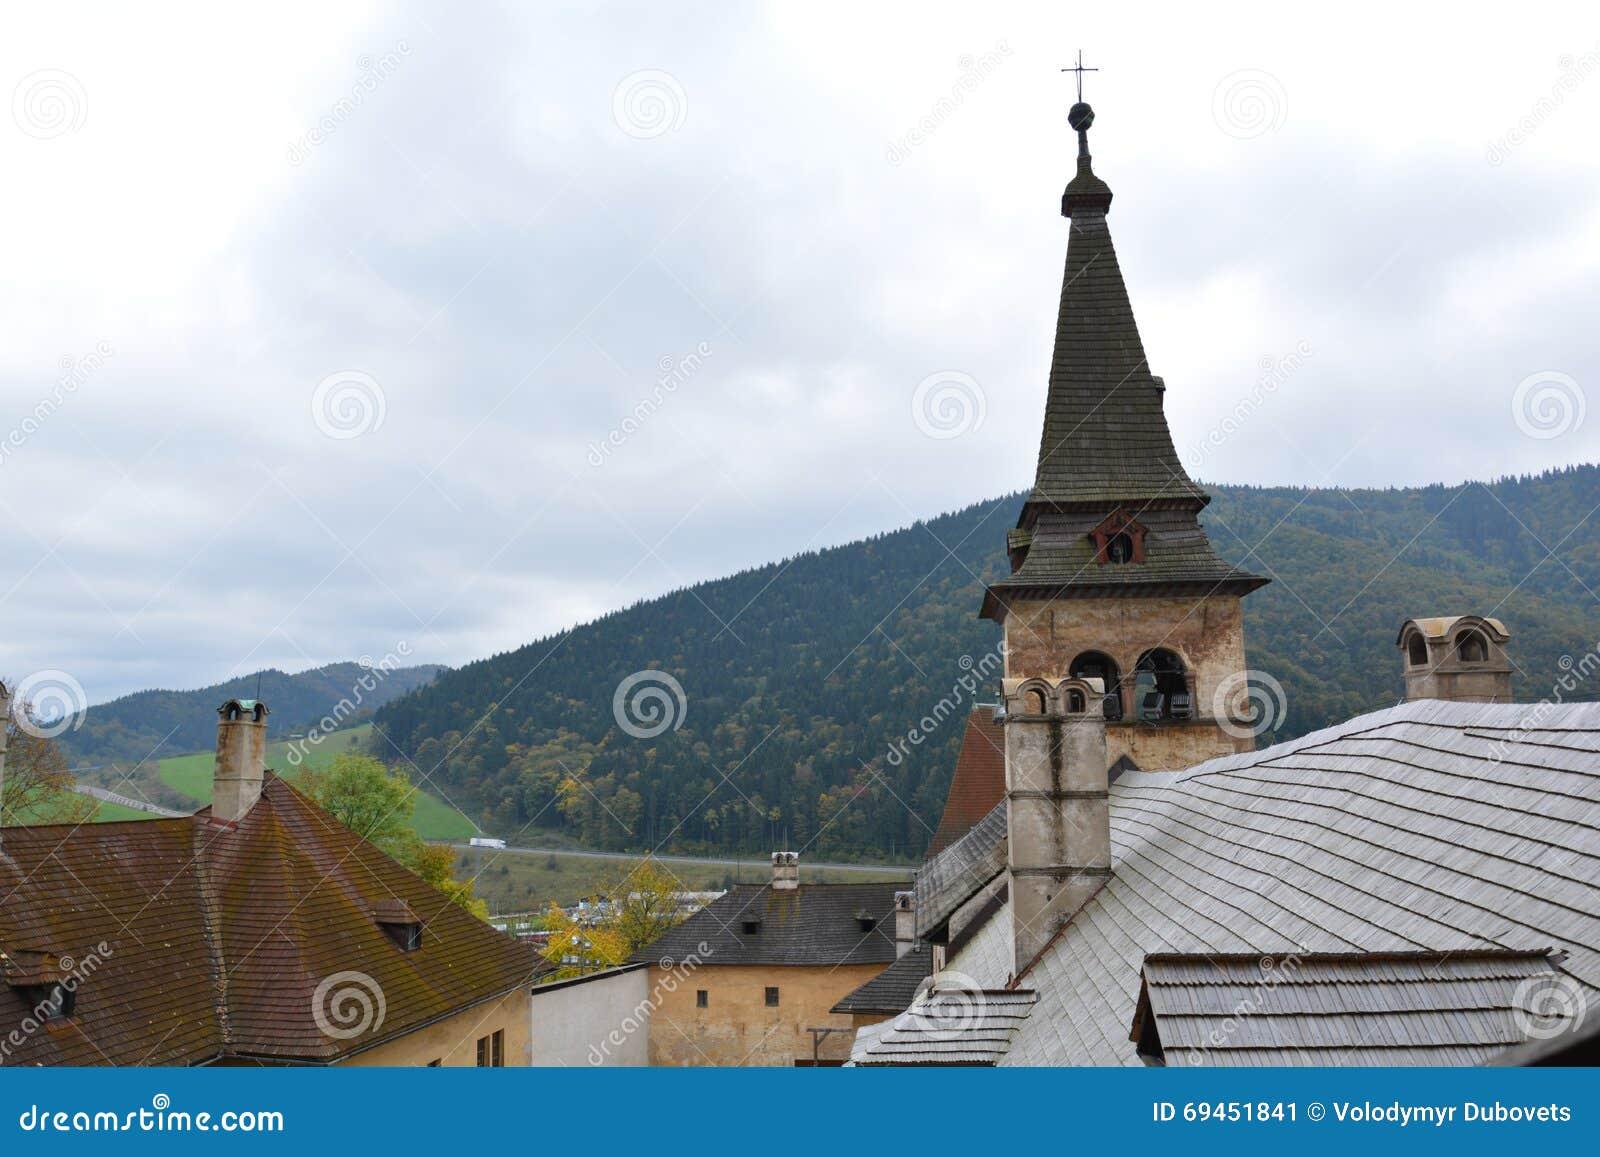 Slovakia. Orava Castle.